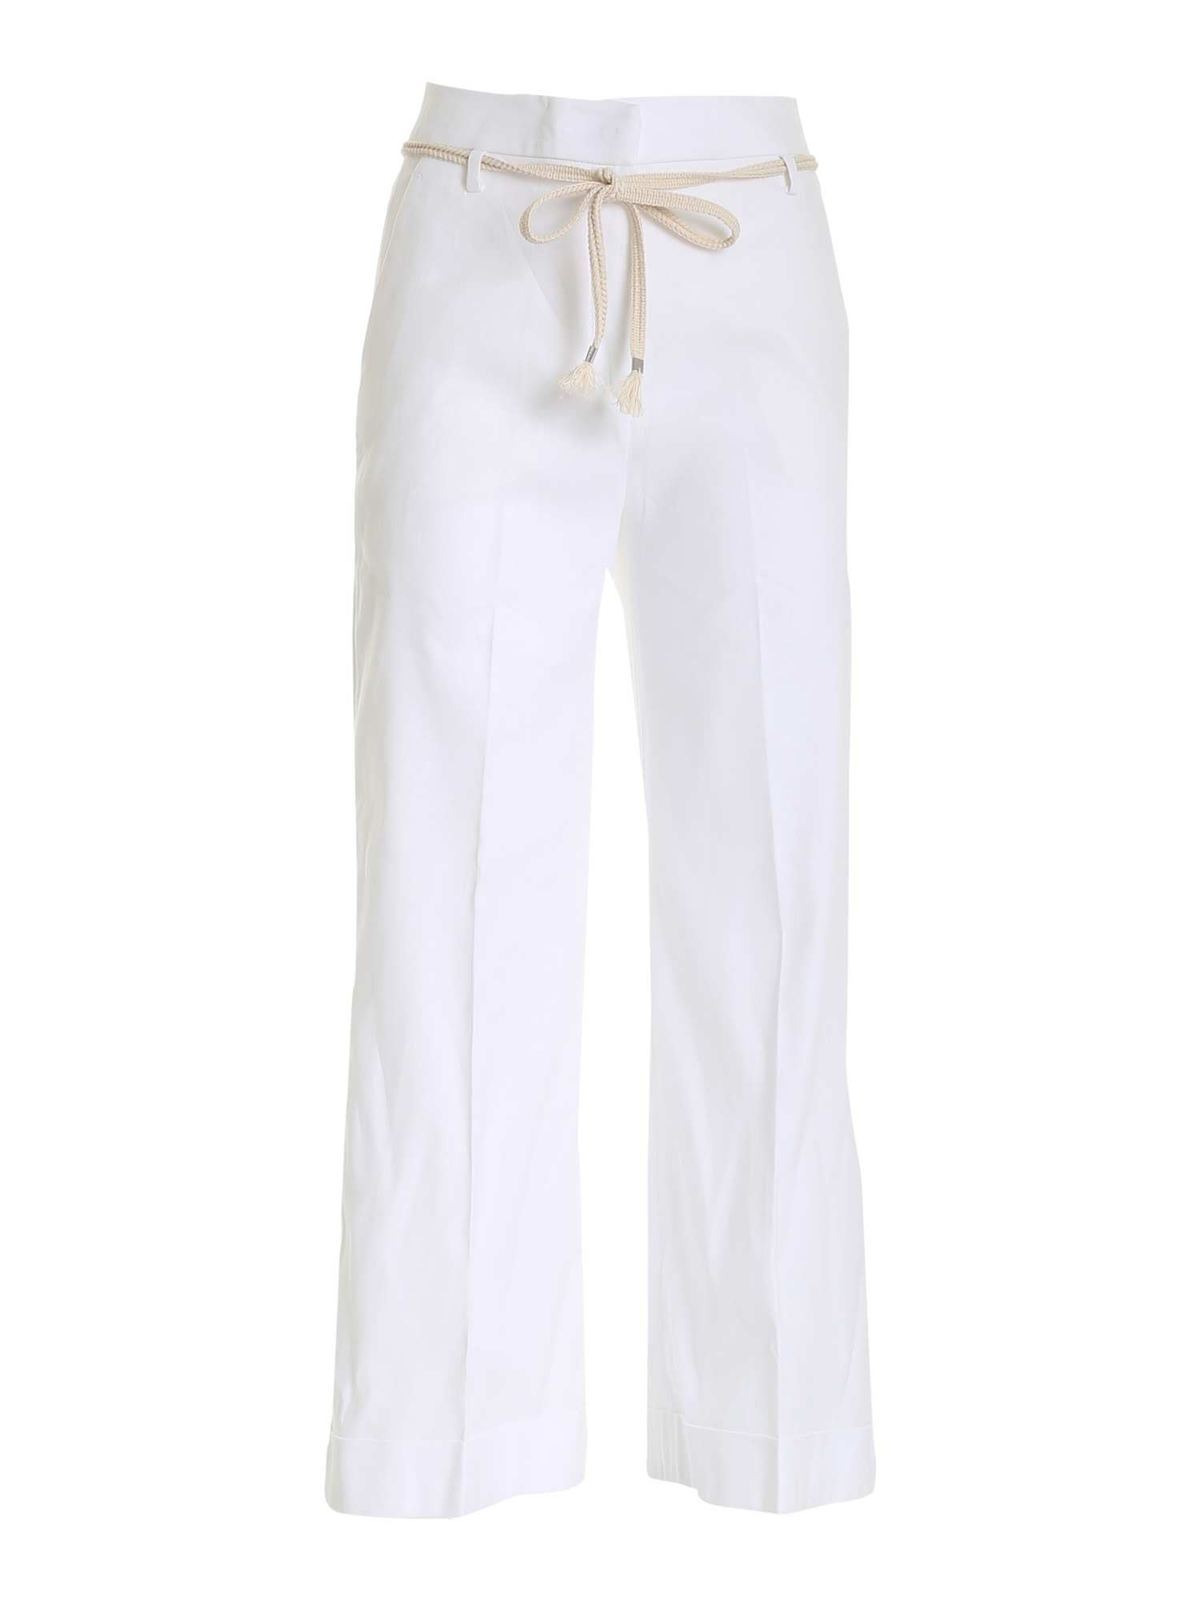 True Royal VALENTINA PANTS IN WHITE